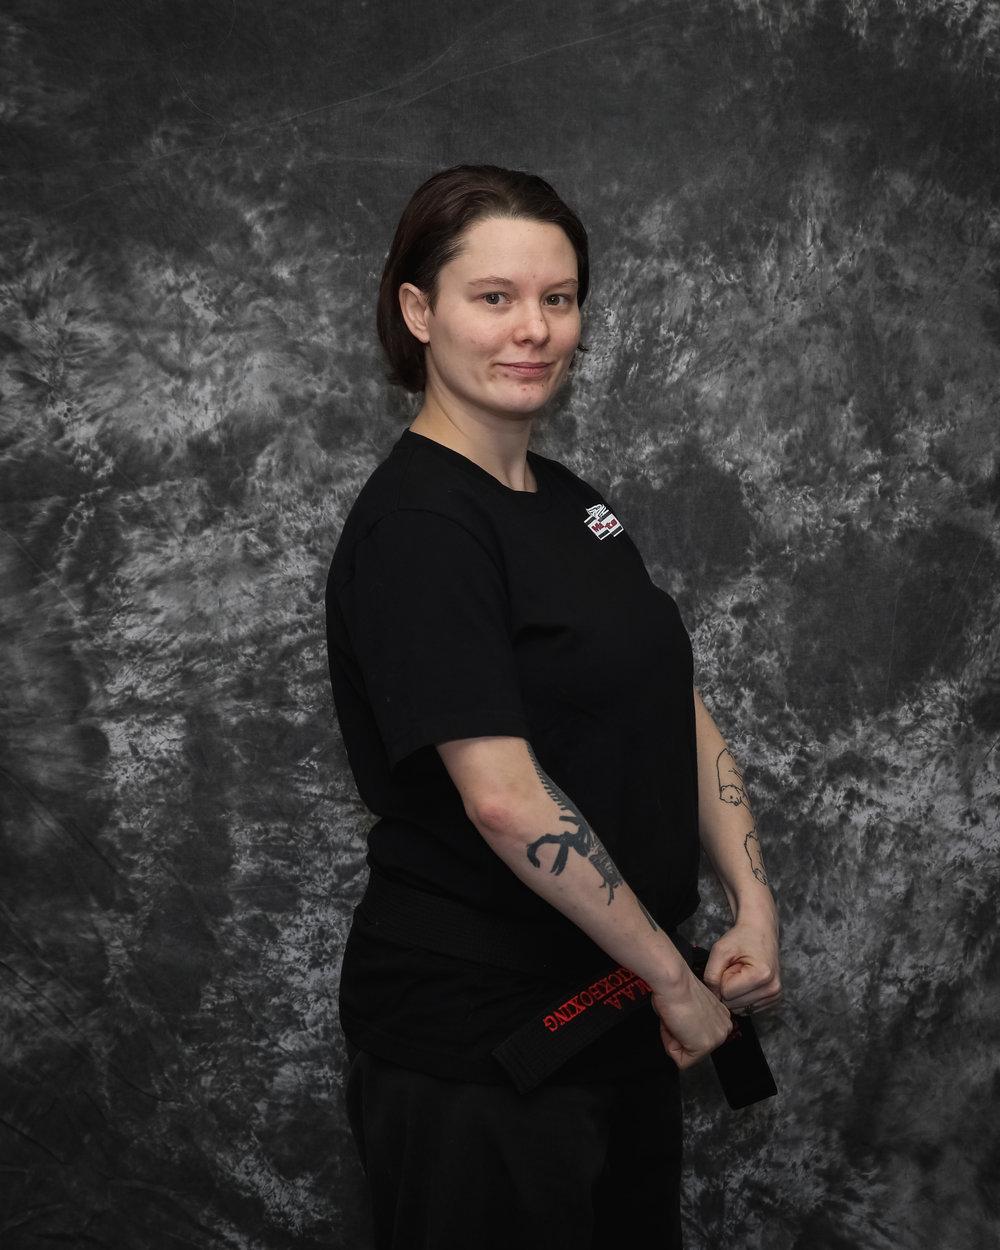 MISS JAMIE REMLEY   1ST DAN BLACK BELT KICKBOXING